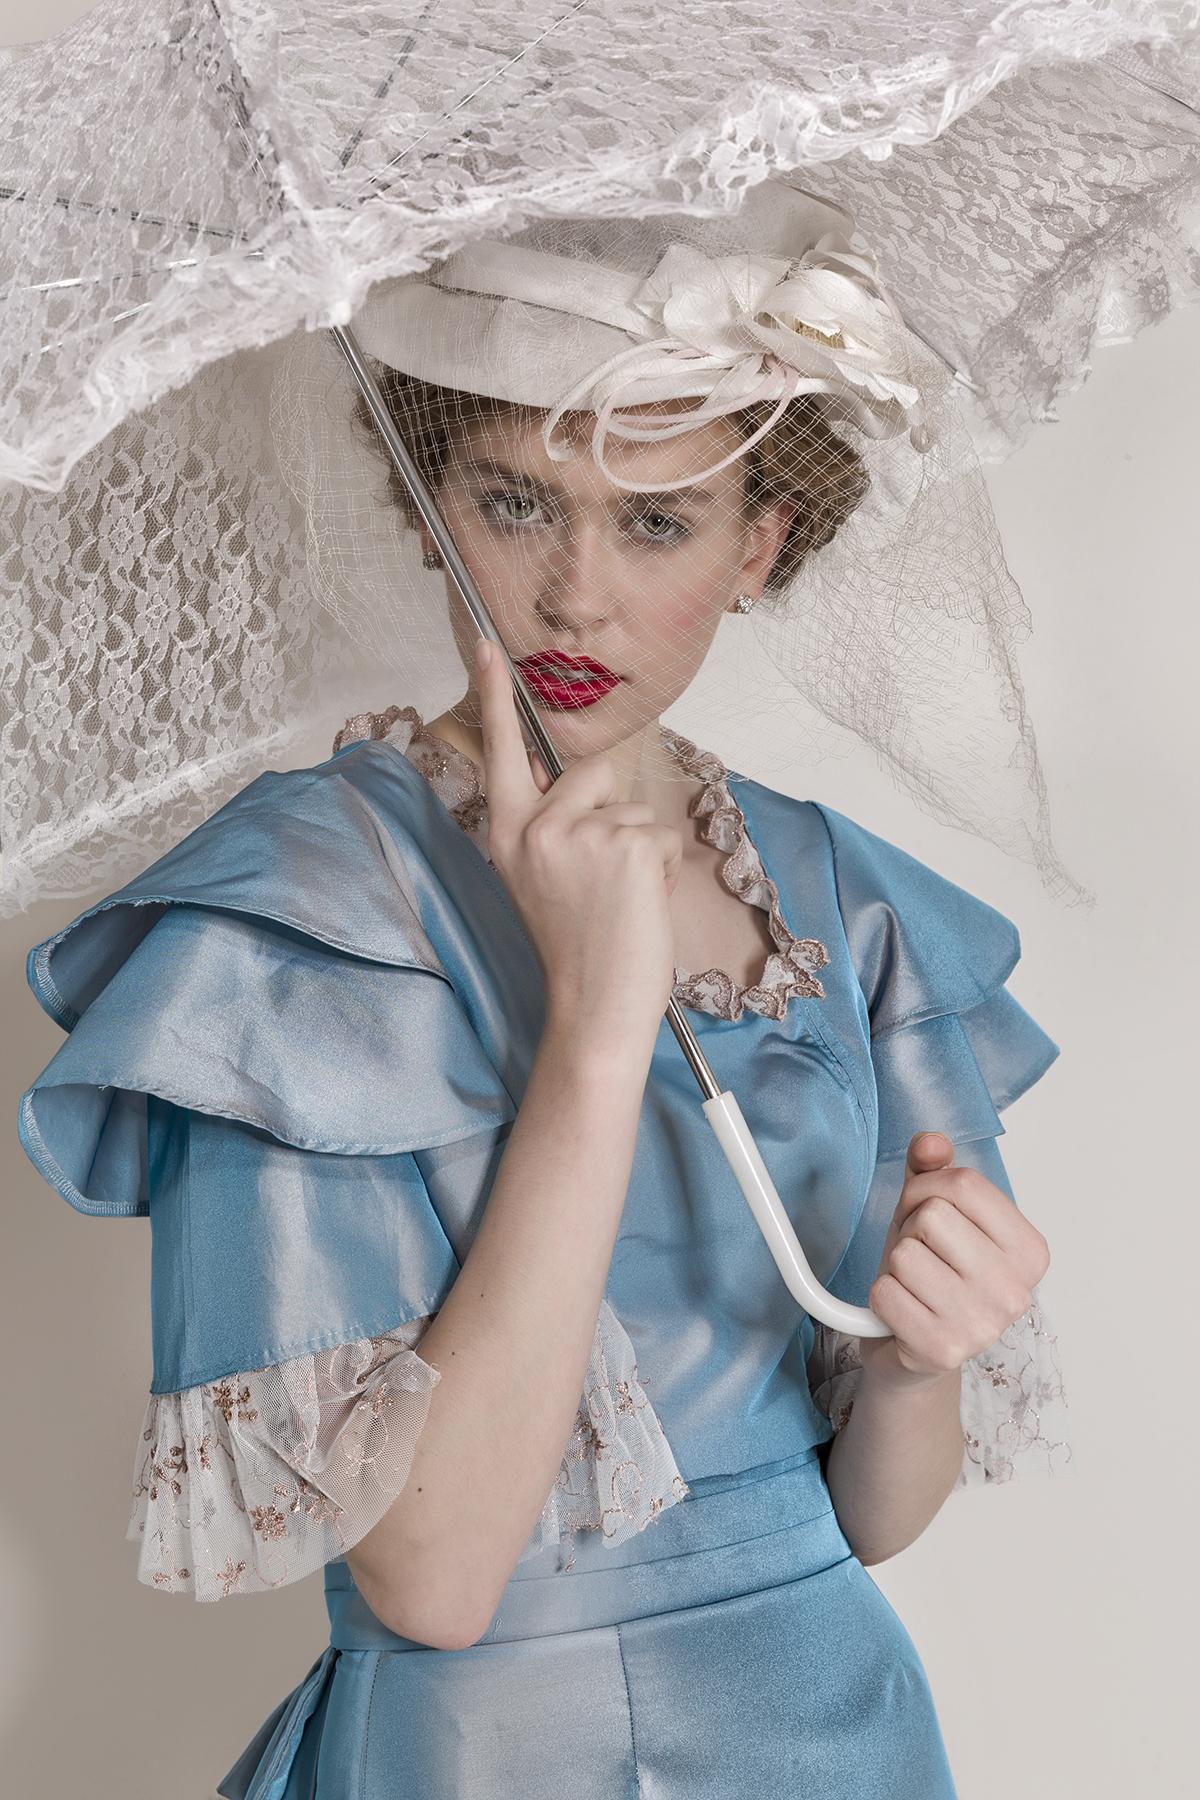 superior quality 6eb4d ca119 Damenmode der 1900er-Jahre – Belle Epoque